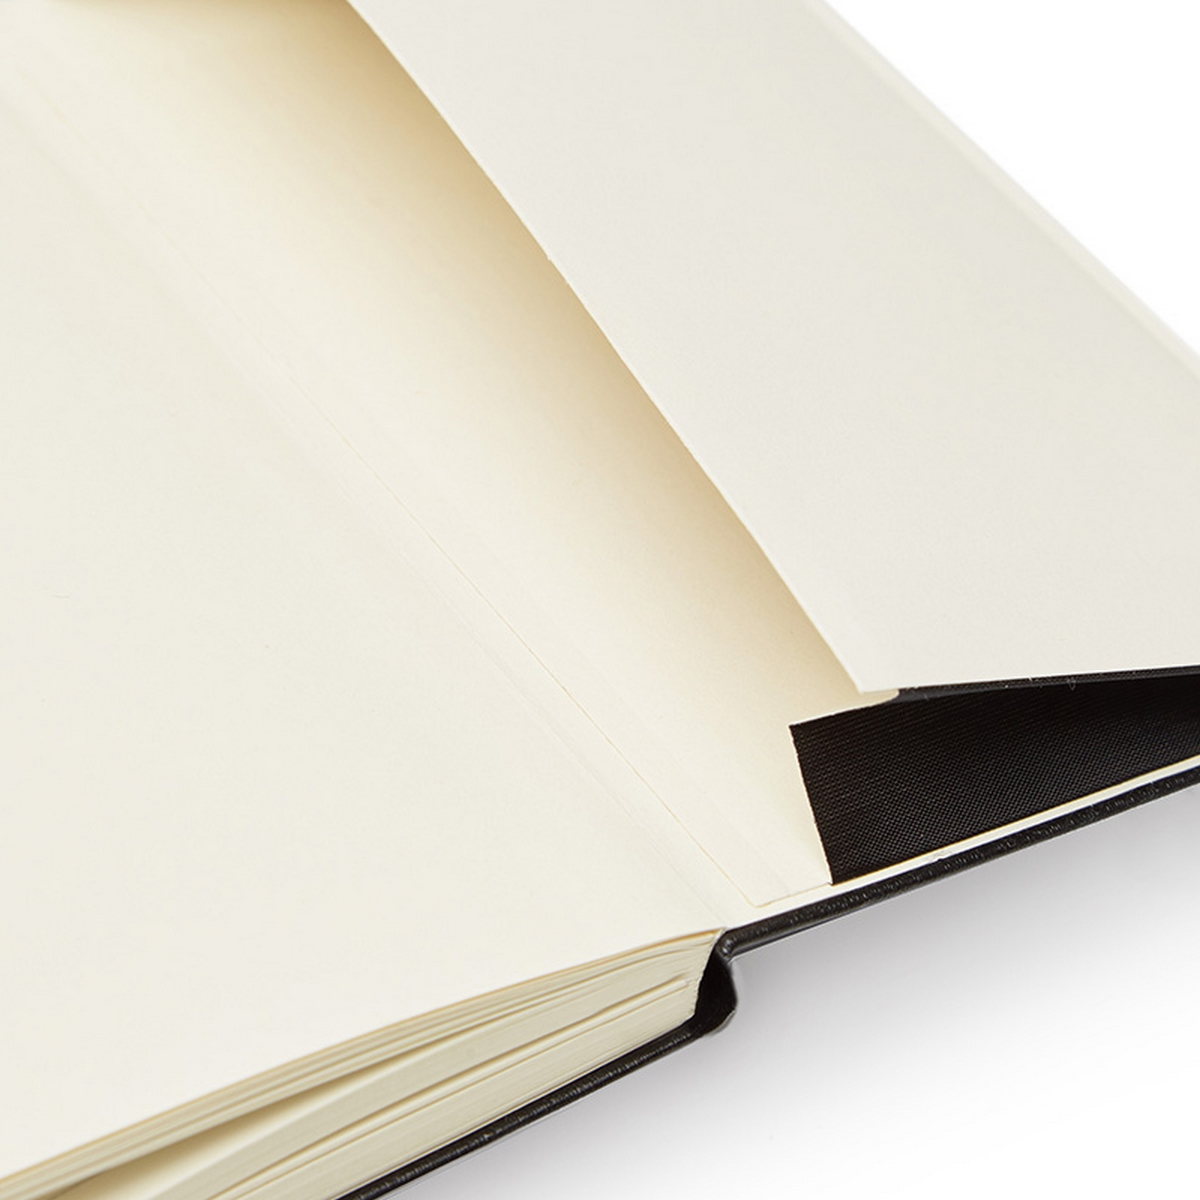 Moleskine Cuaderno Tapa Dura 9x14